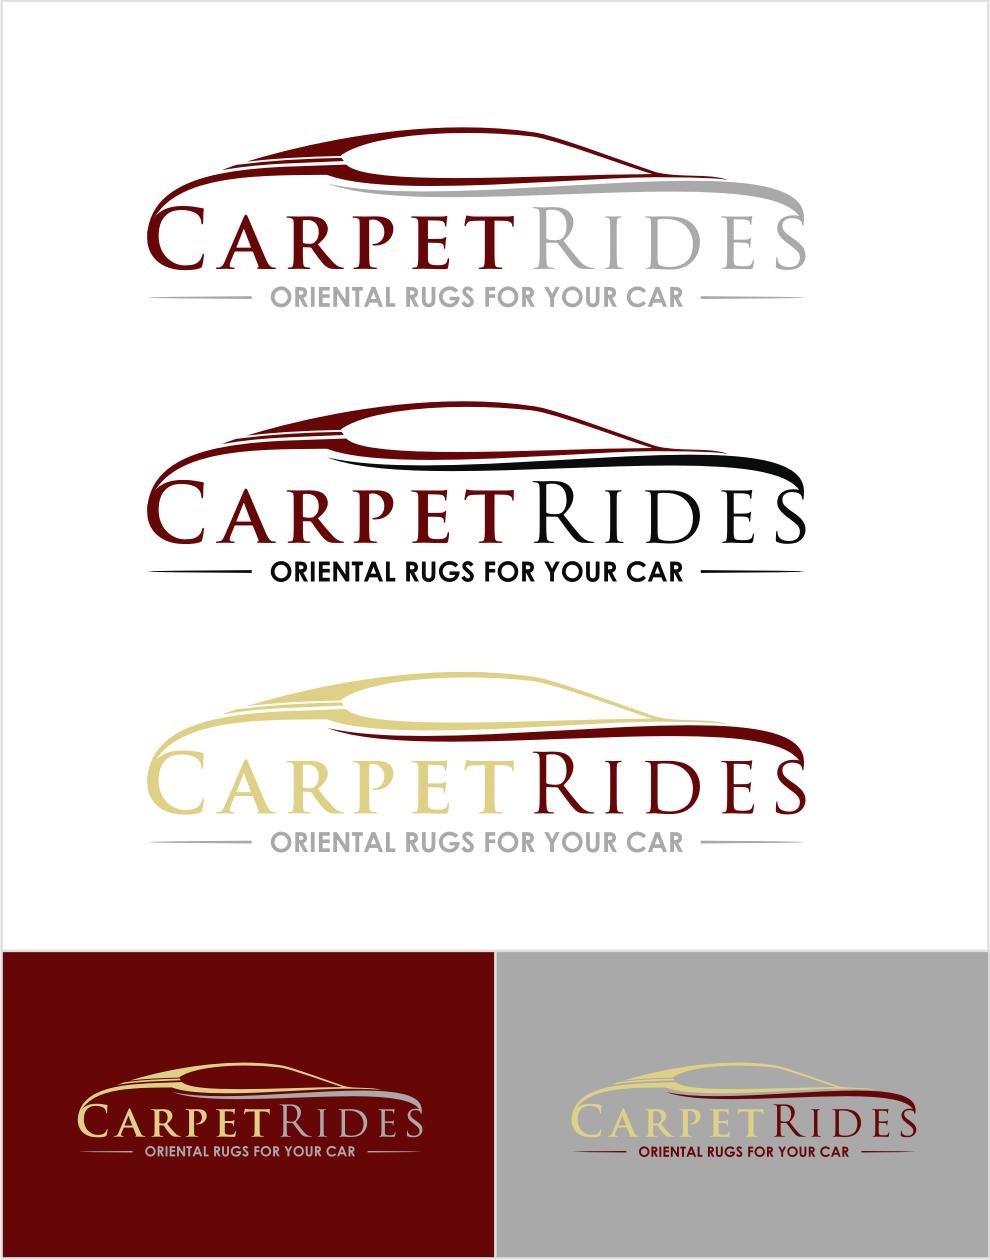 Create the new Carpet Rides Logo!